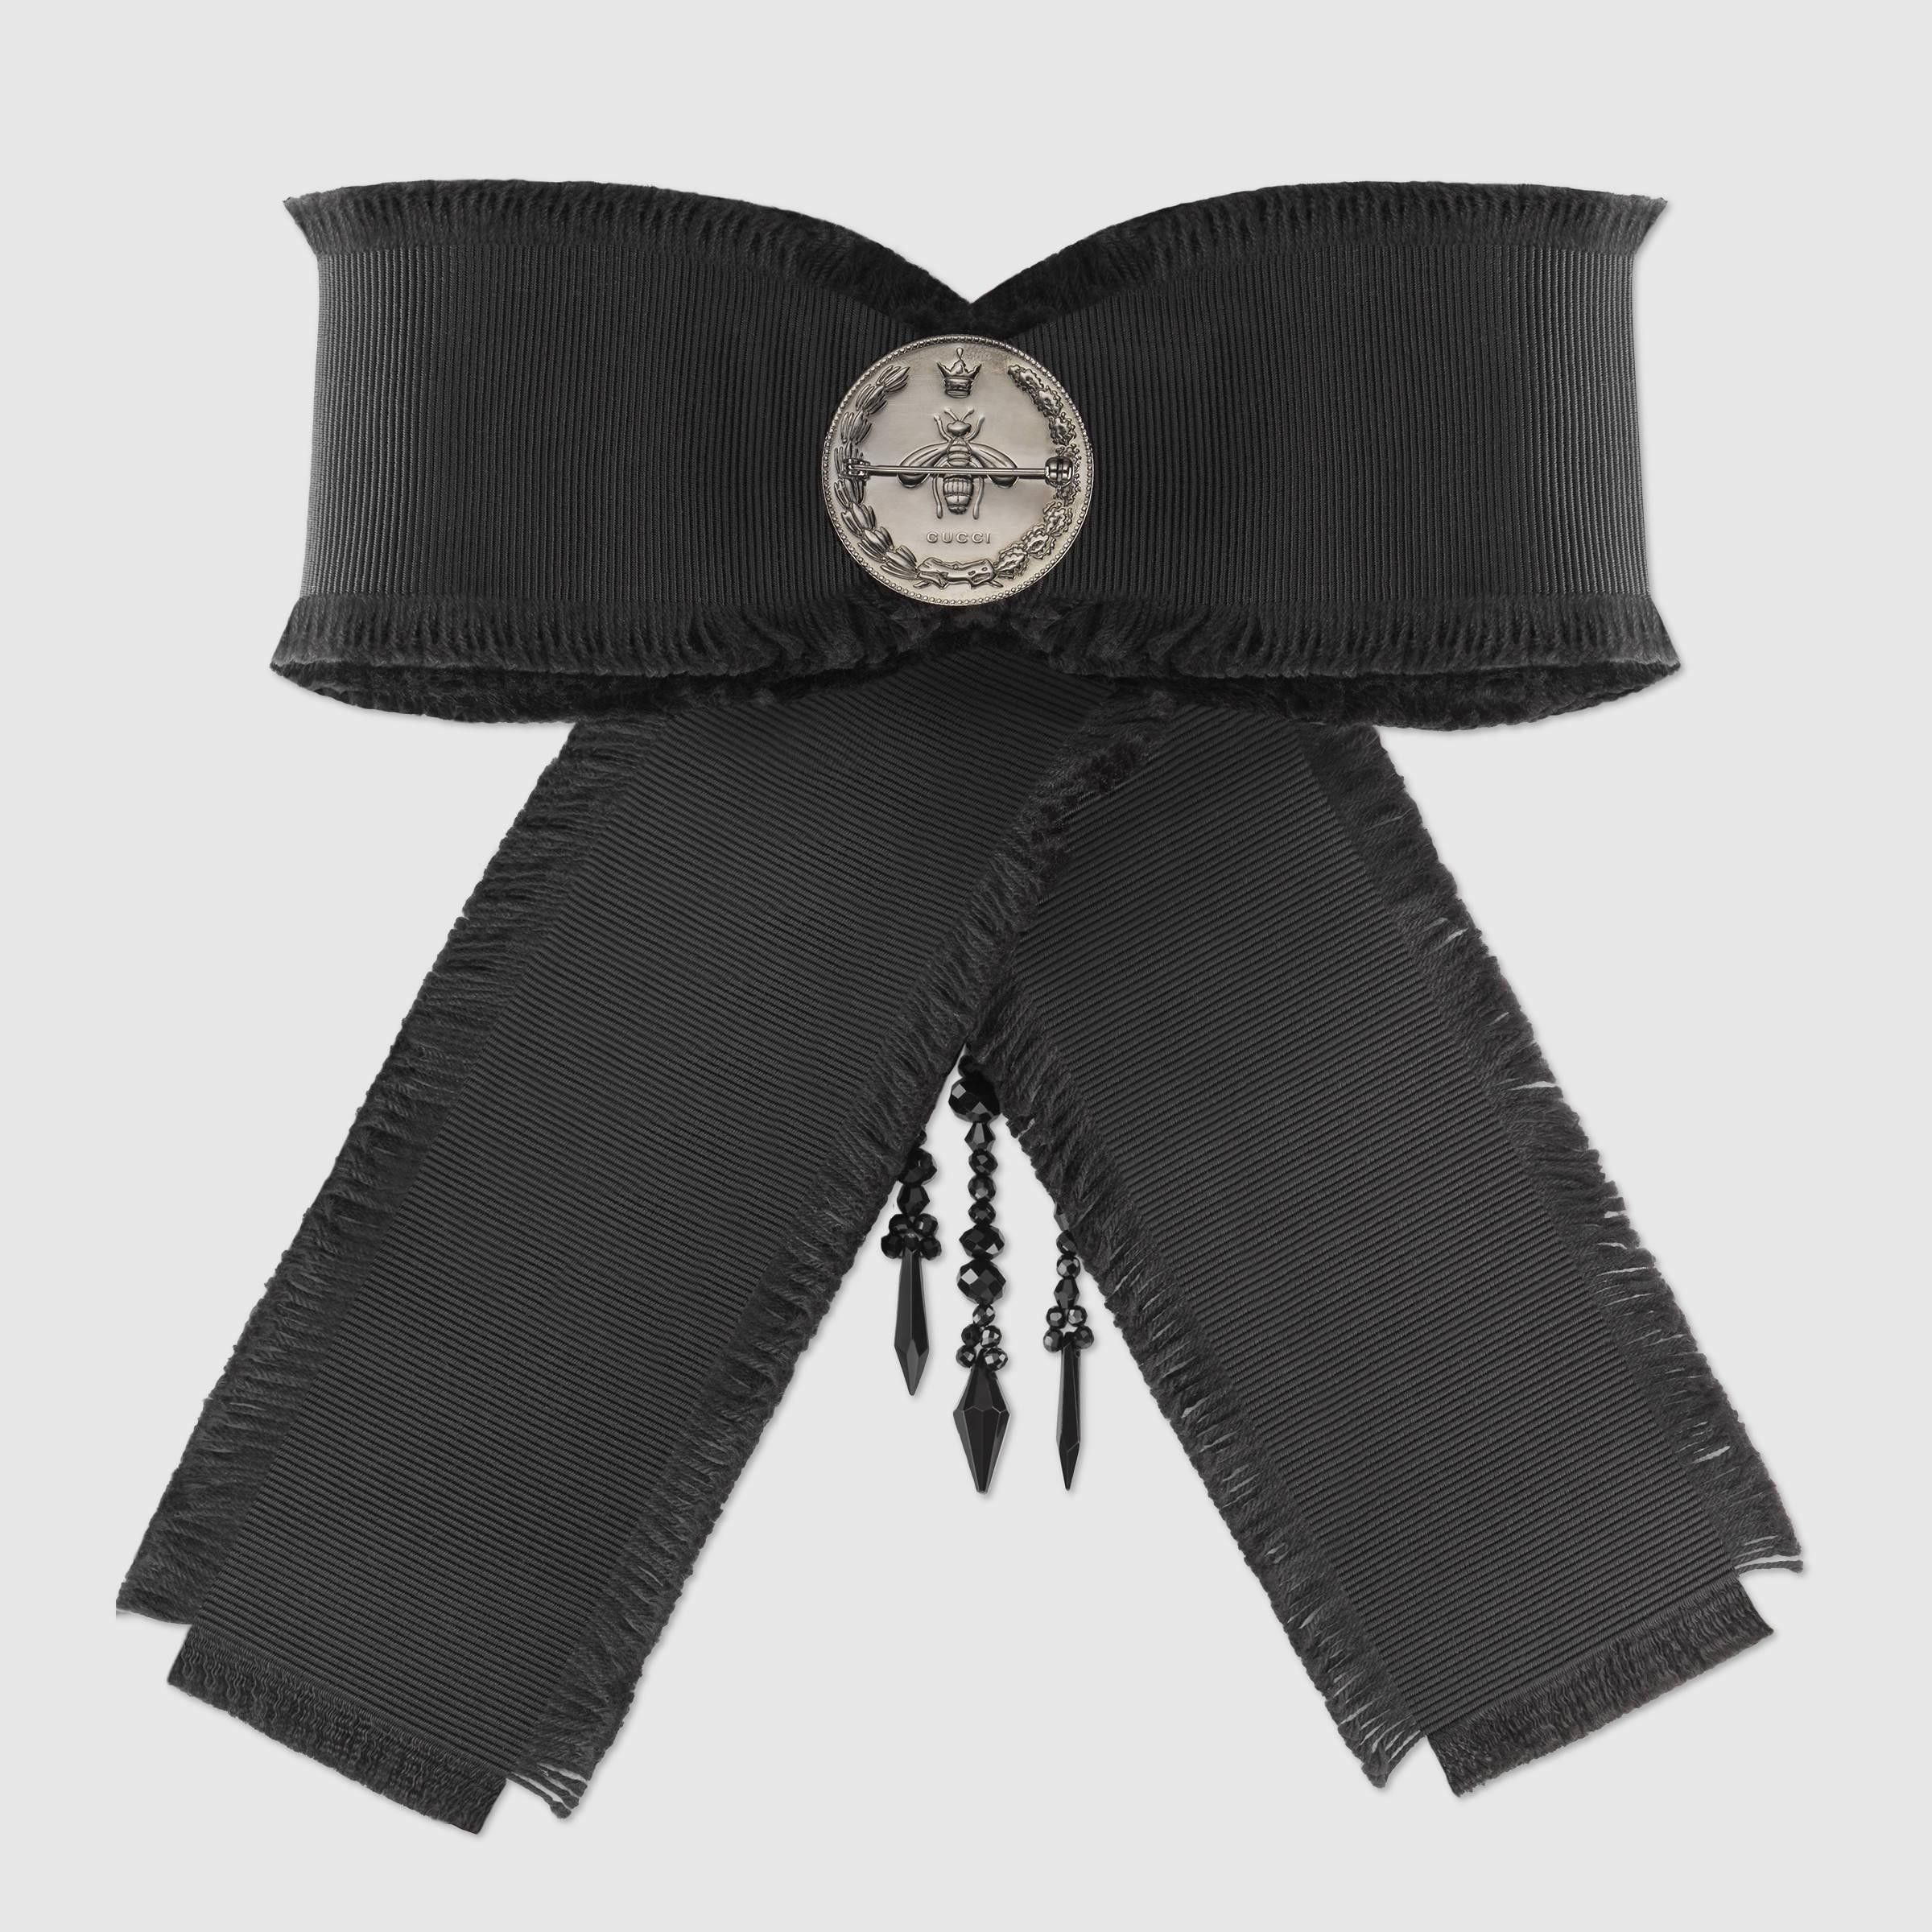 Gucci Brooches  Lyst Gucci Grosgrain Bow Brooch in Black